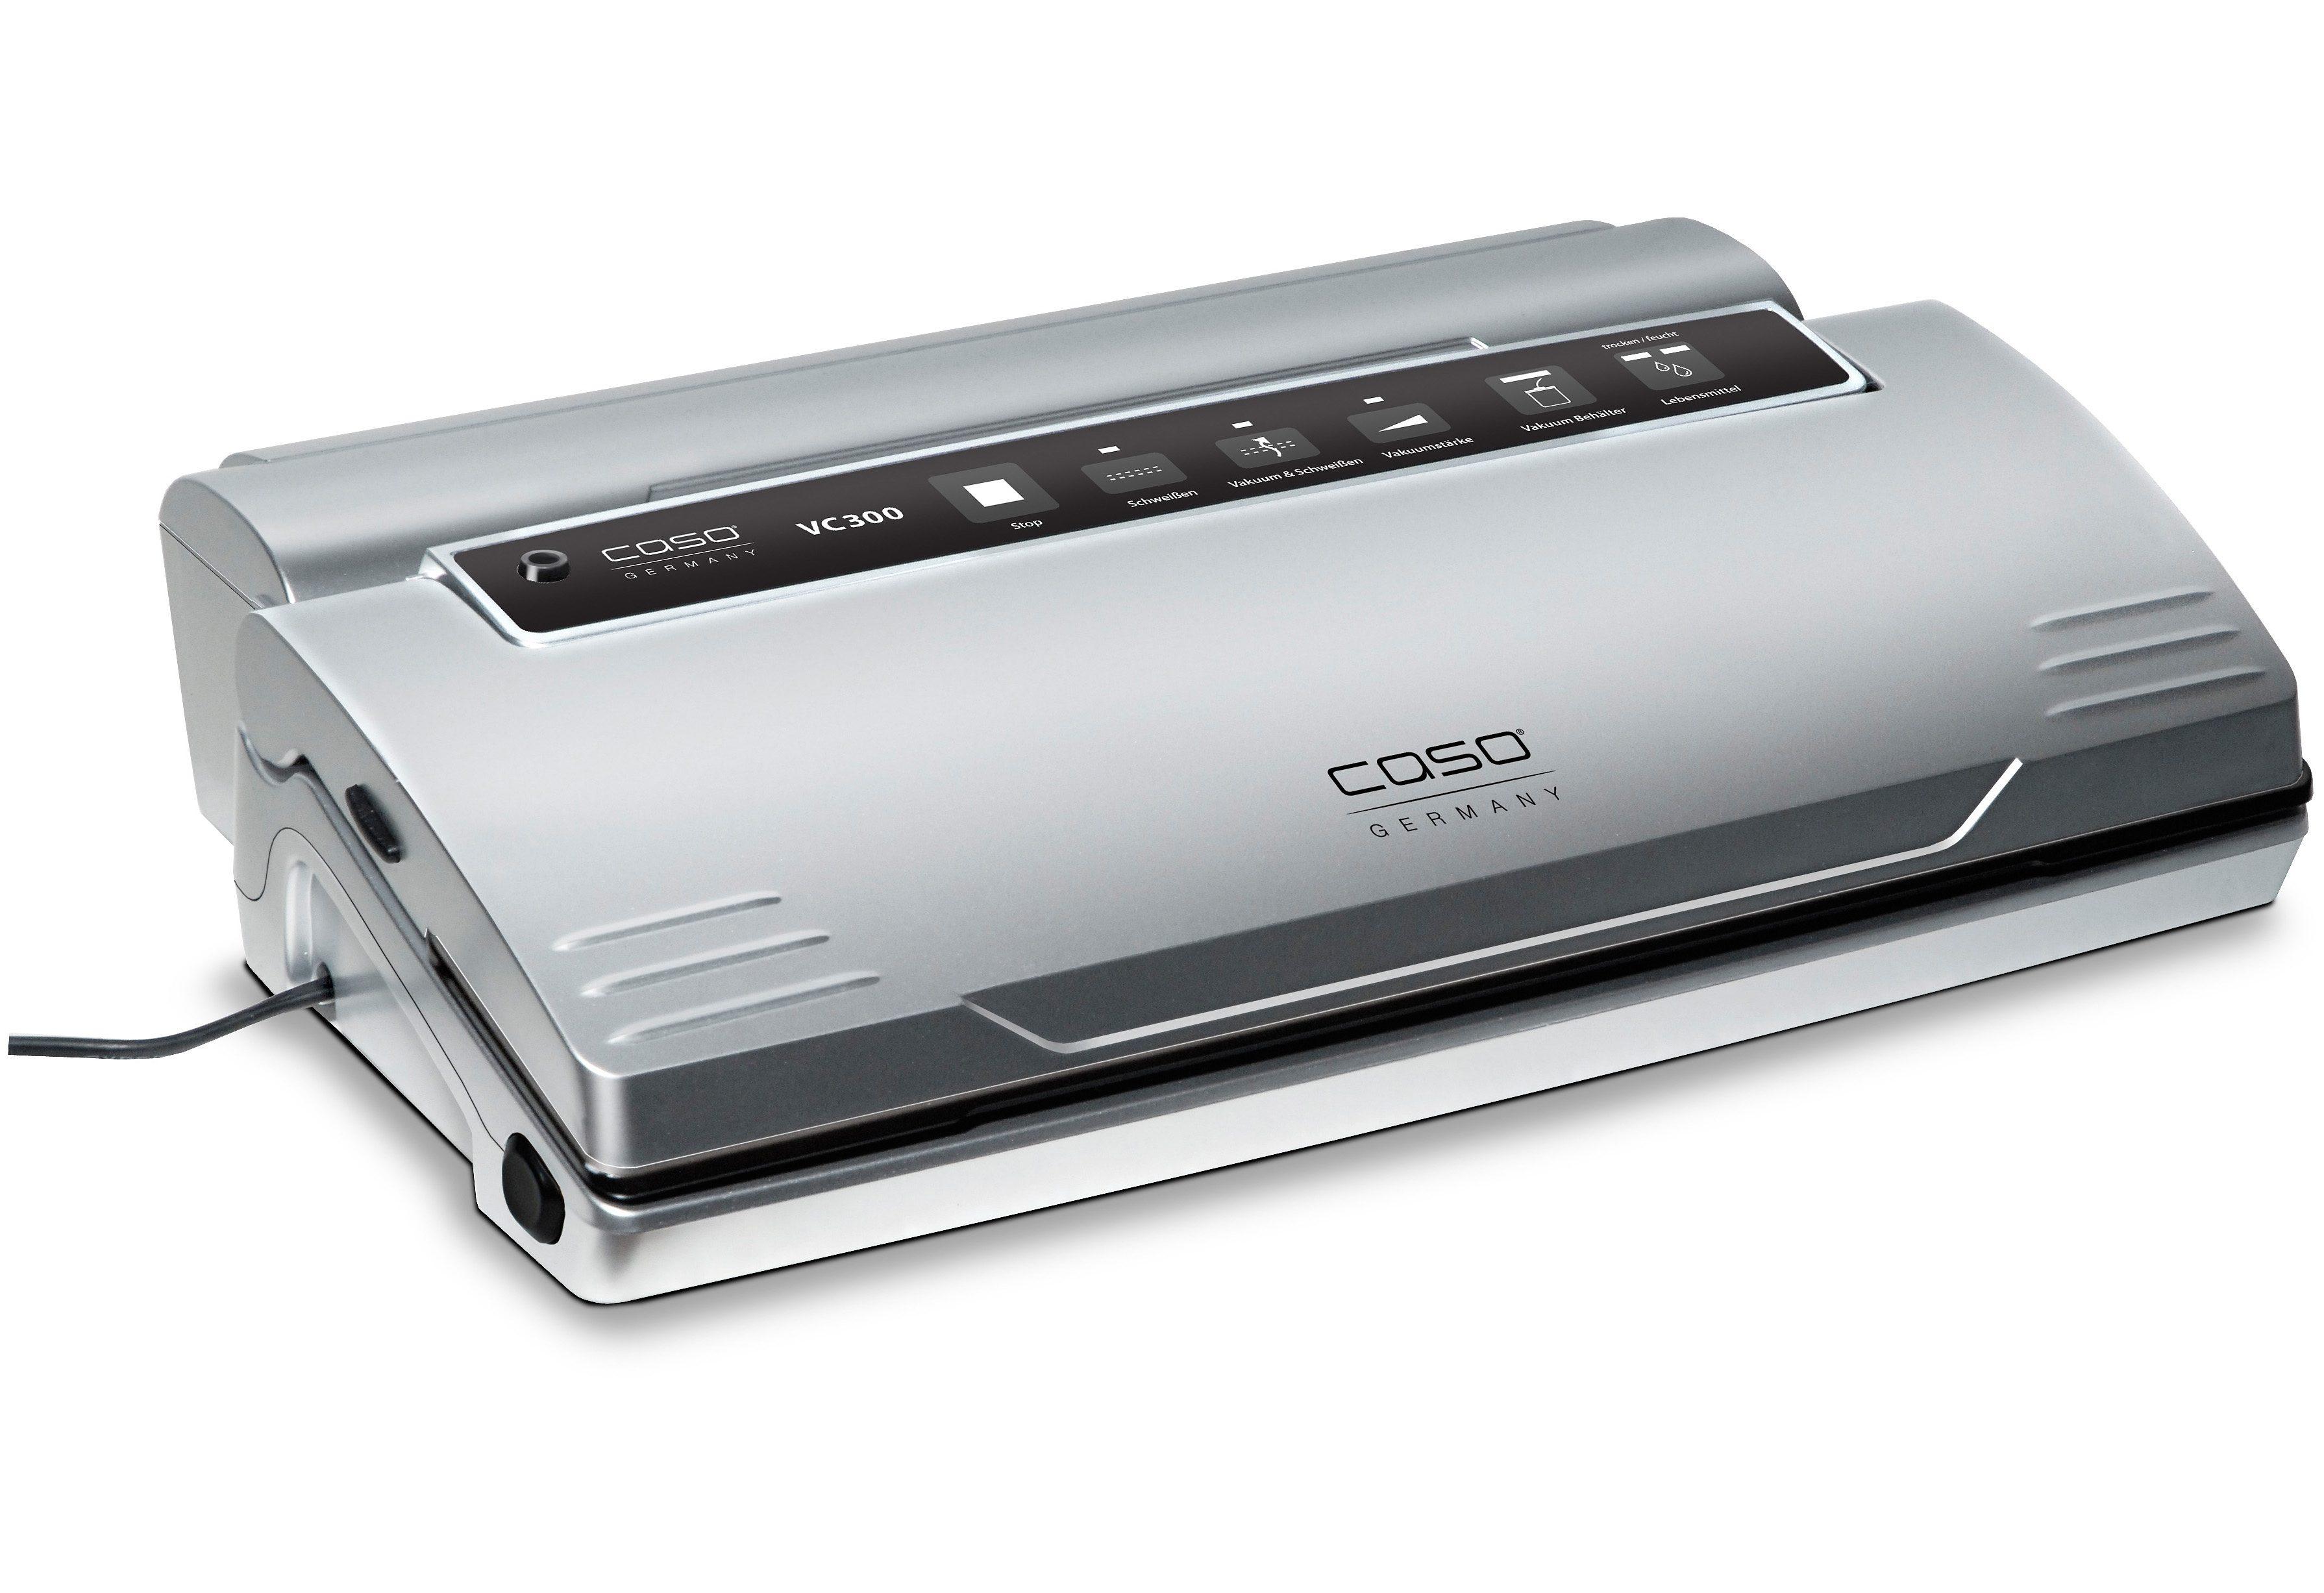 caso Germany Vakuumierer VC 300 Pro